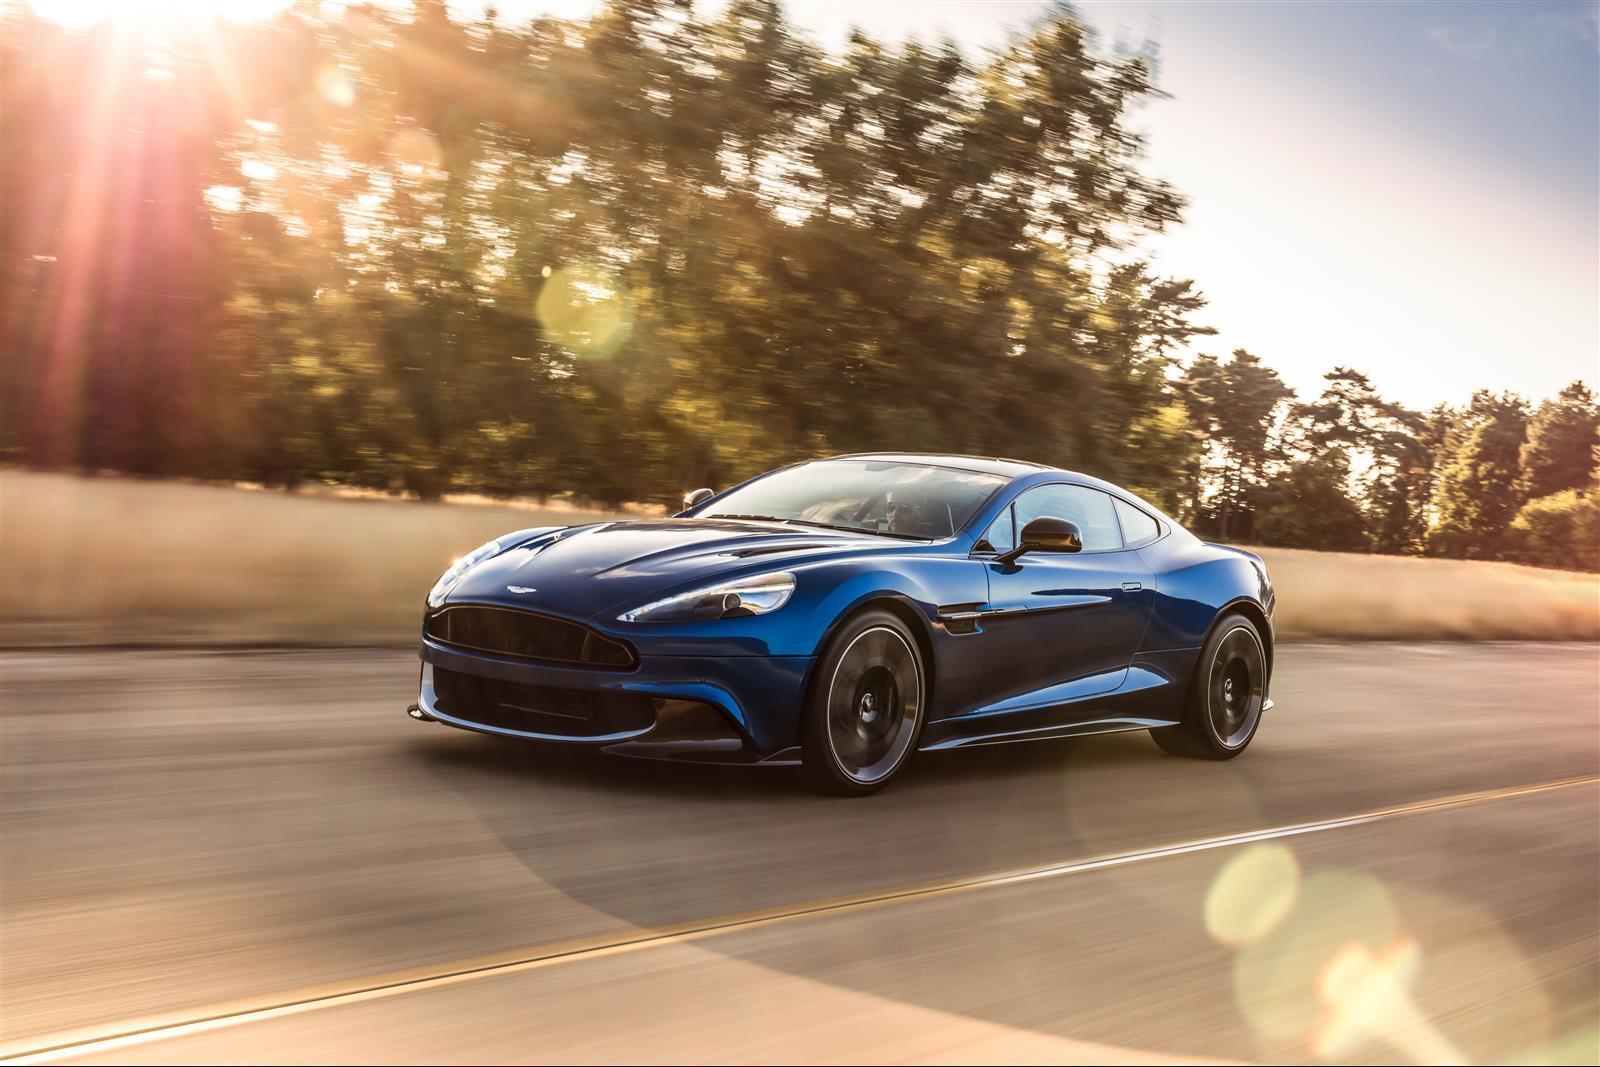 Aston Martin Vanquish S L Aston Martin Beverly Hills L An OGara - Aston martin los angeles